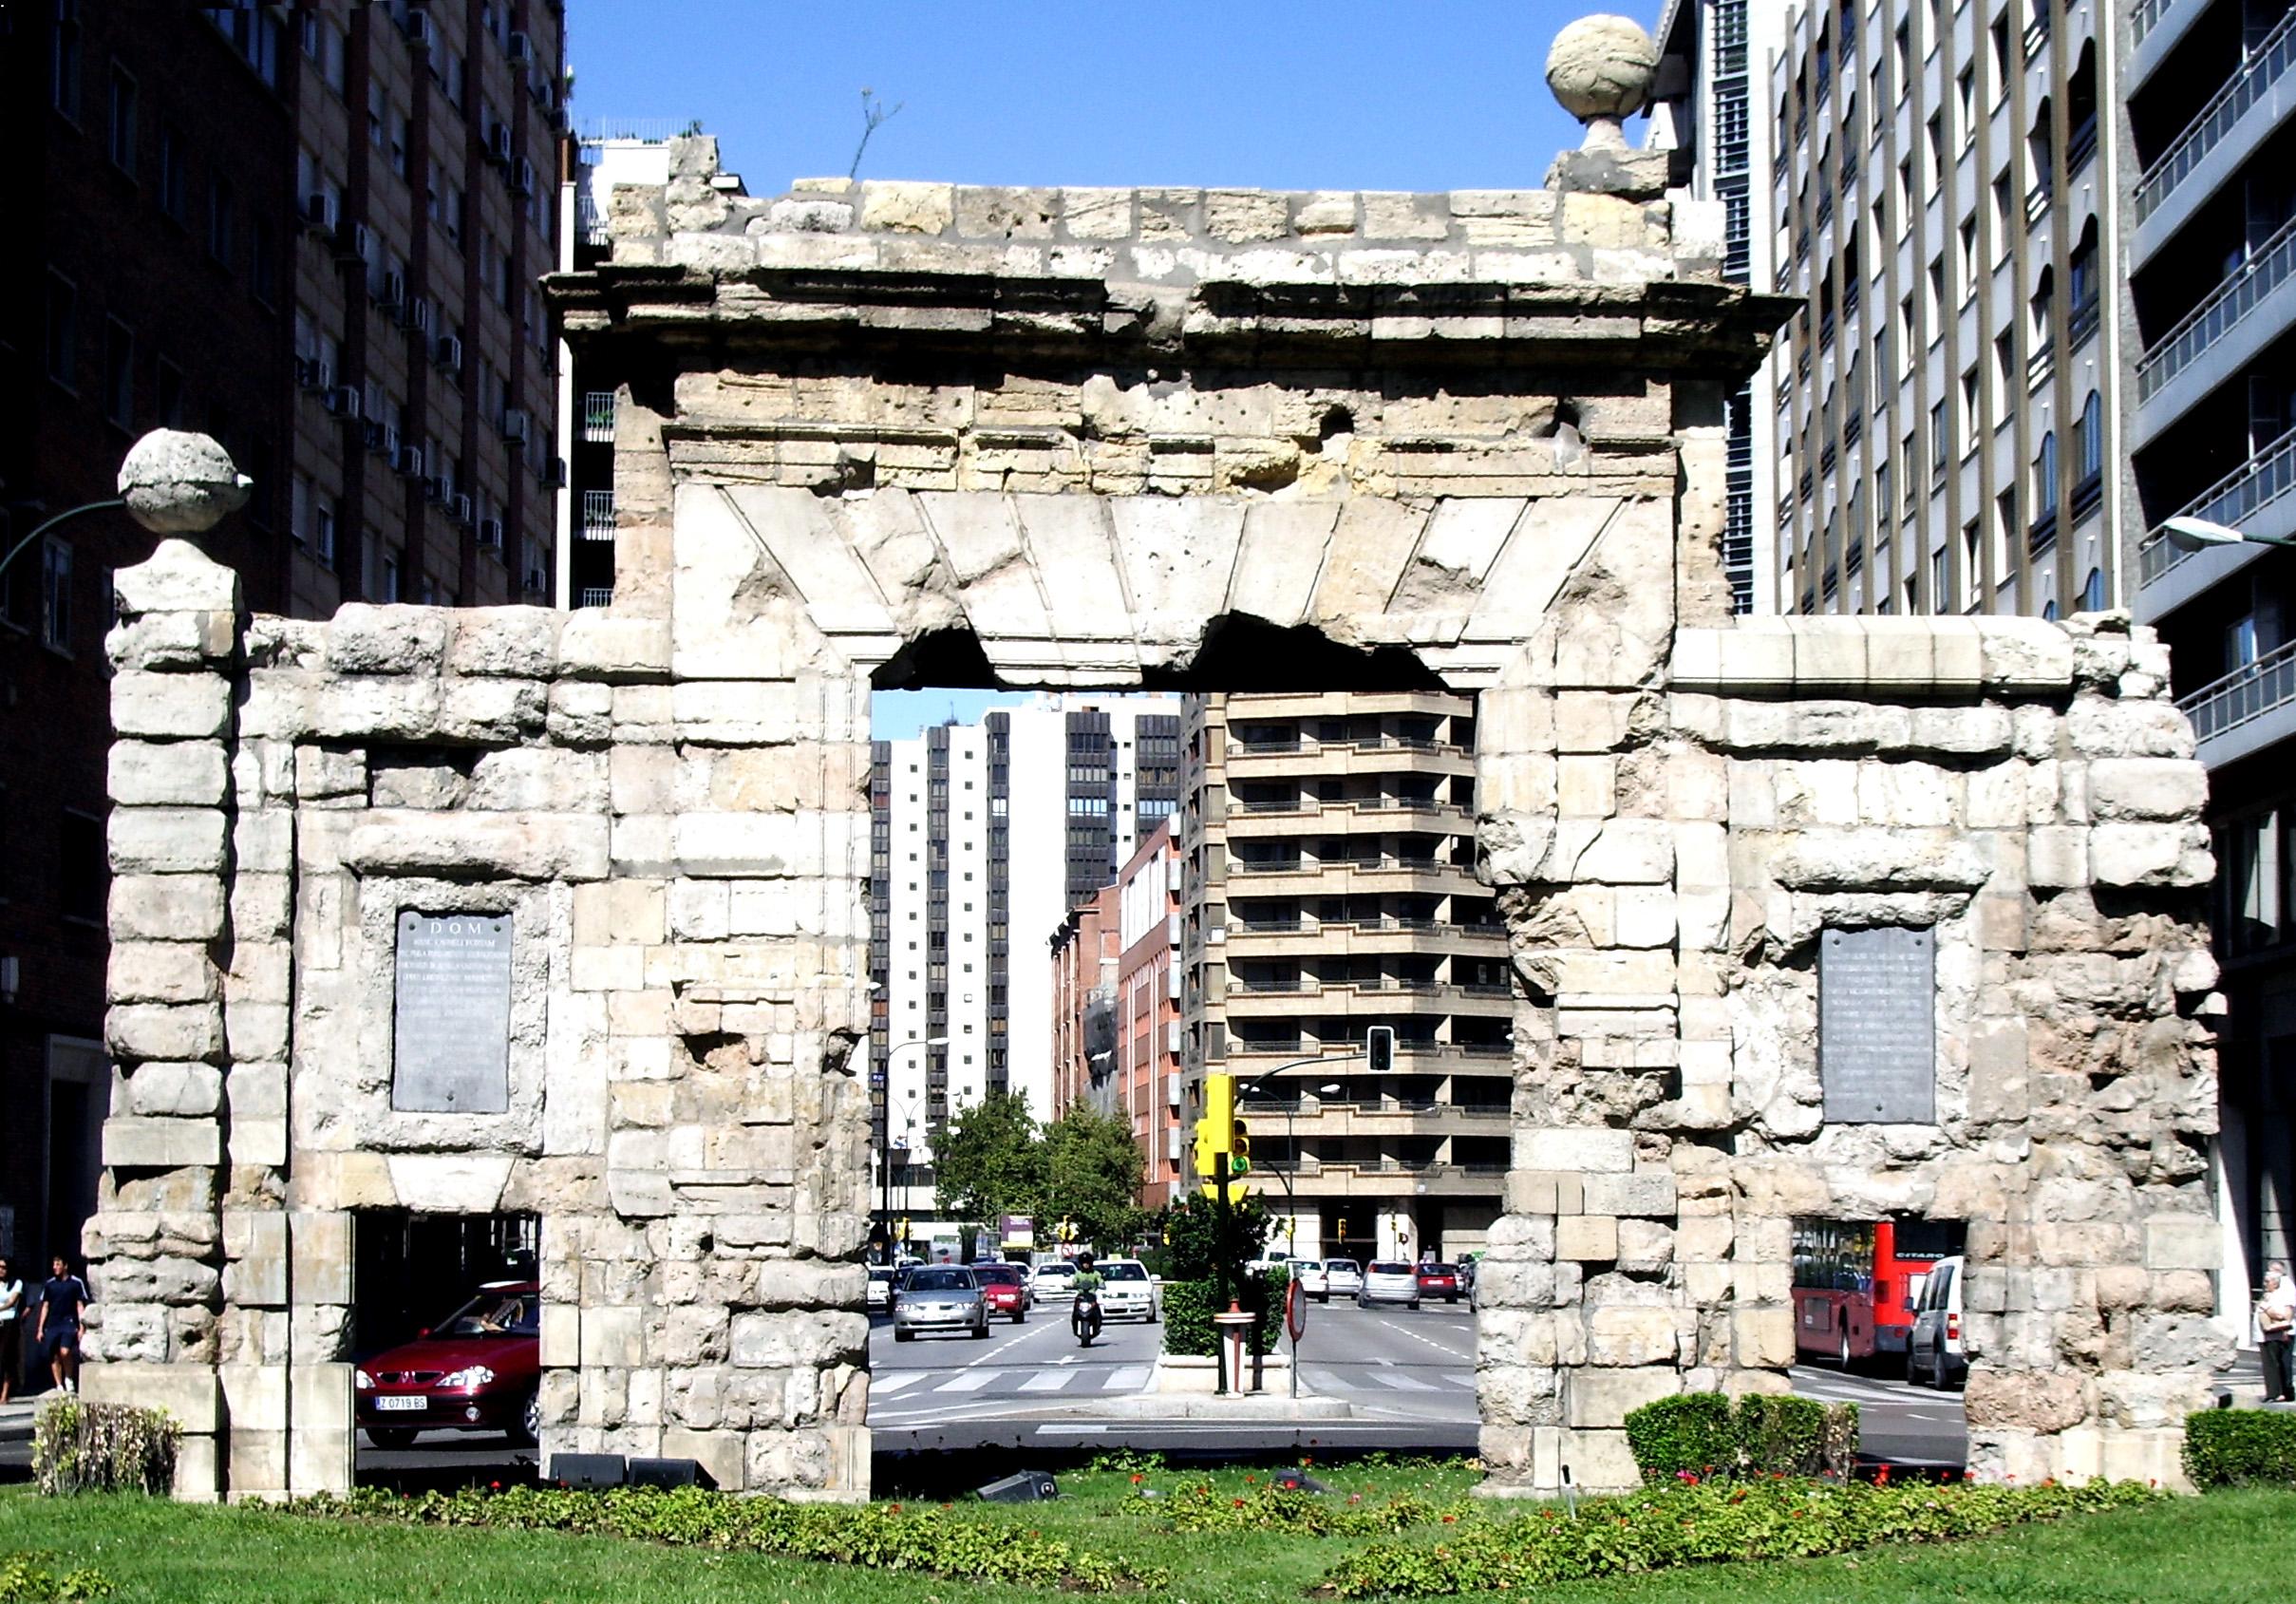 Porte du carmen wikiwand for Puerta 9 autodromo